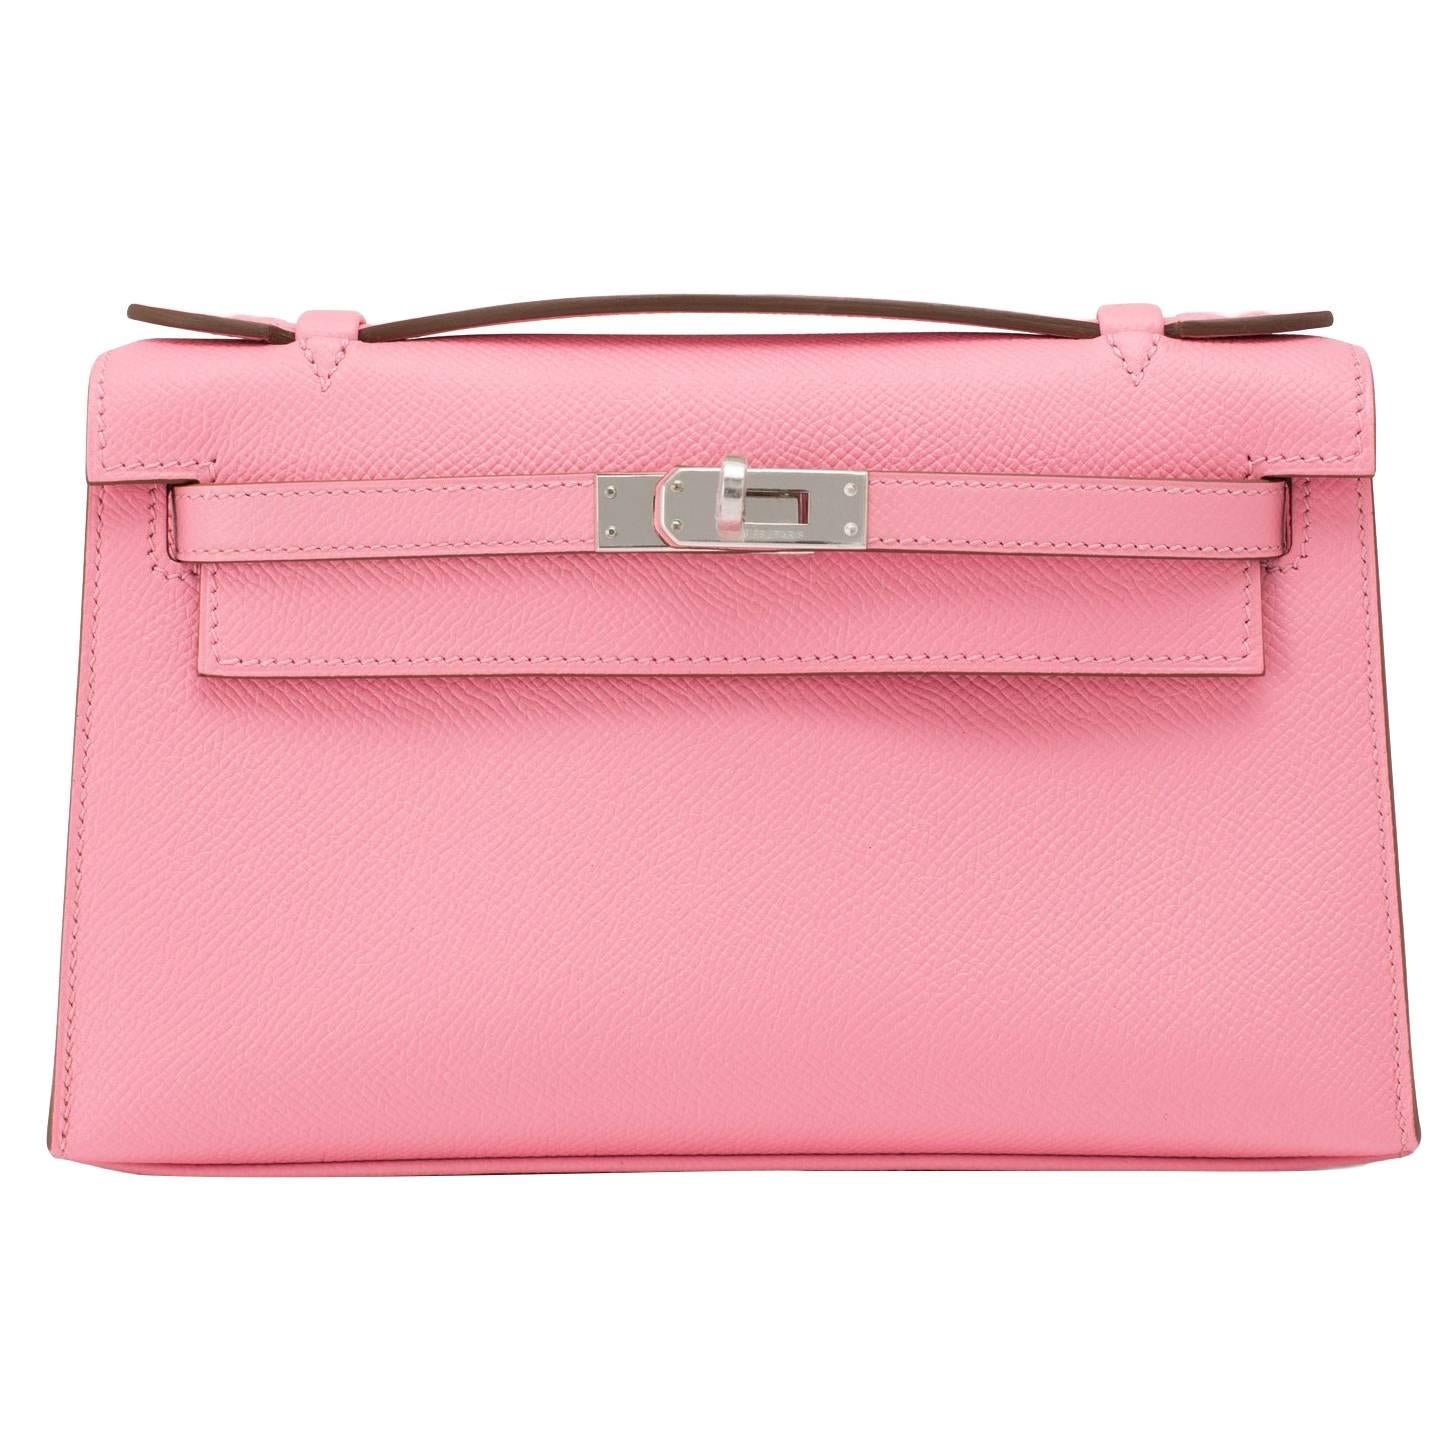 47800497e9 Pink Hermes Bags - 128 For Sale on 1stdibs